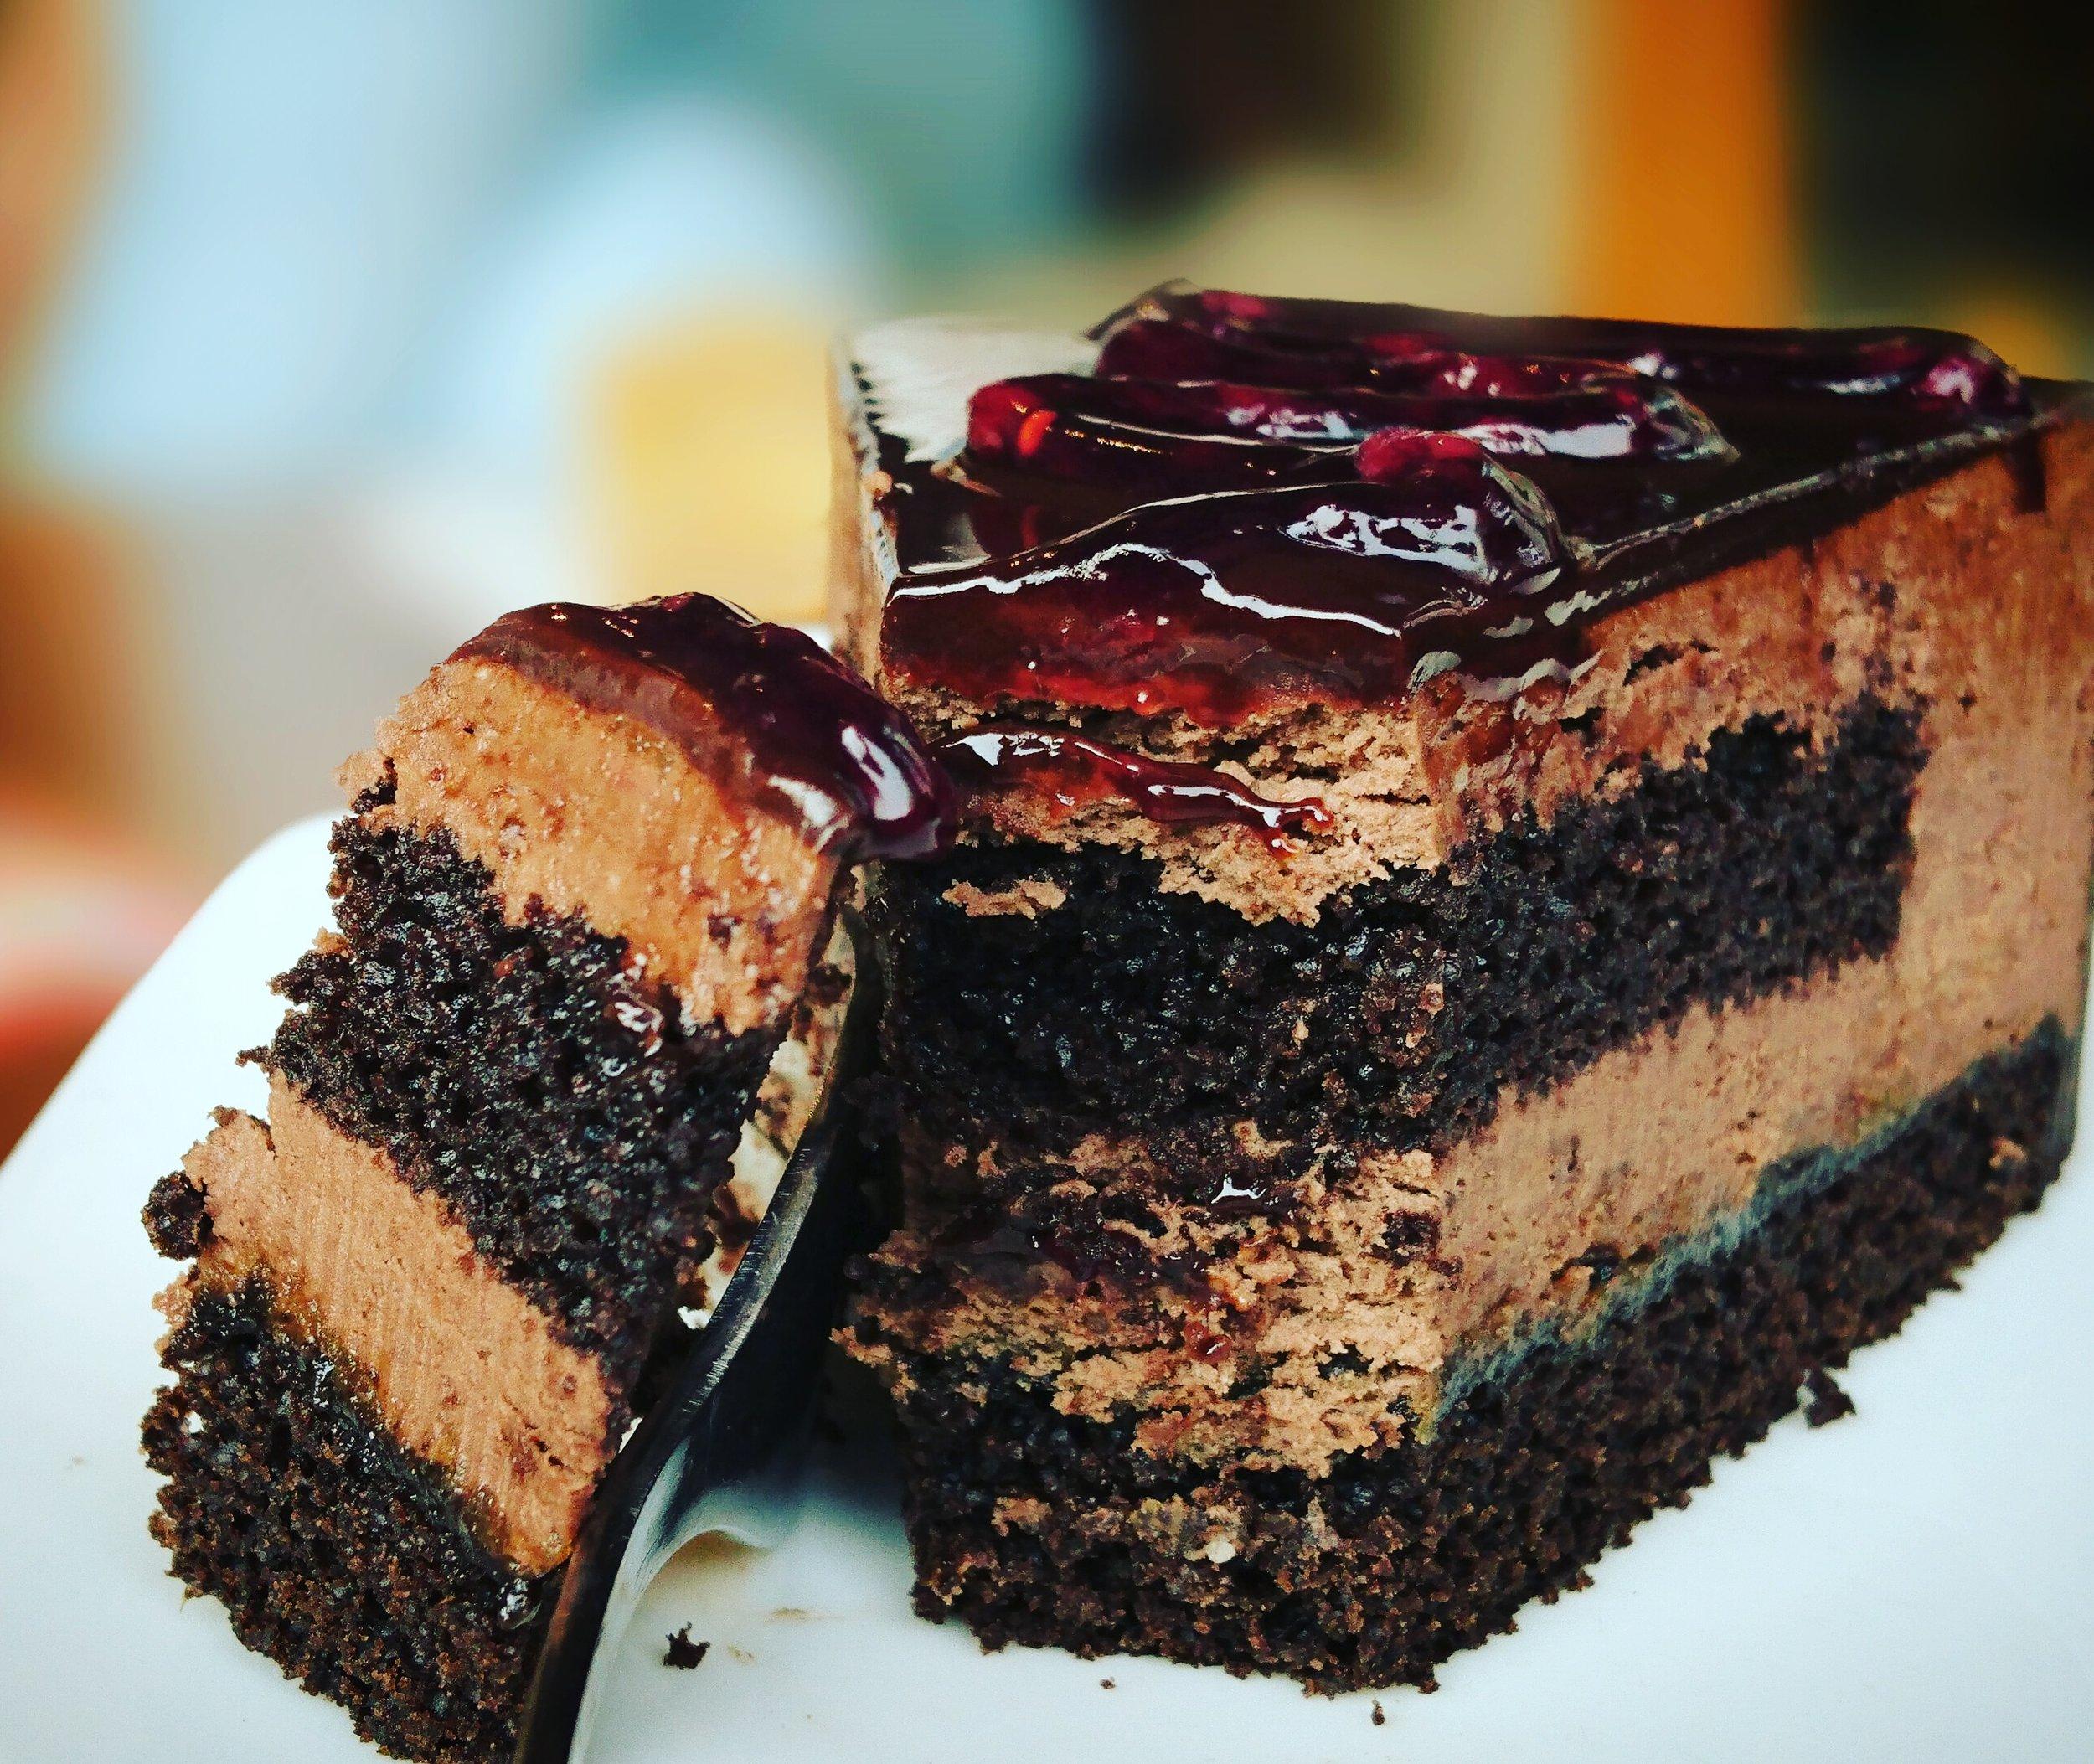 Teas & Cakes -